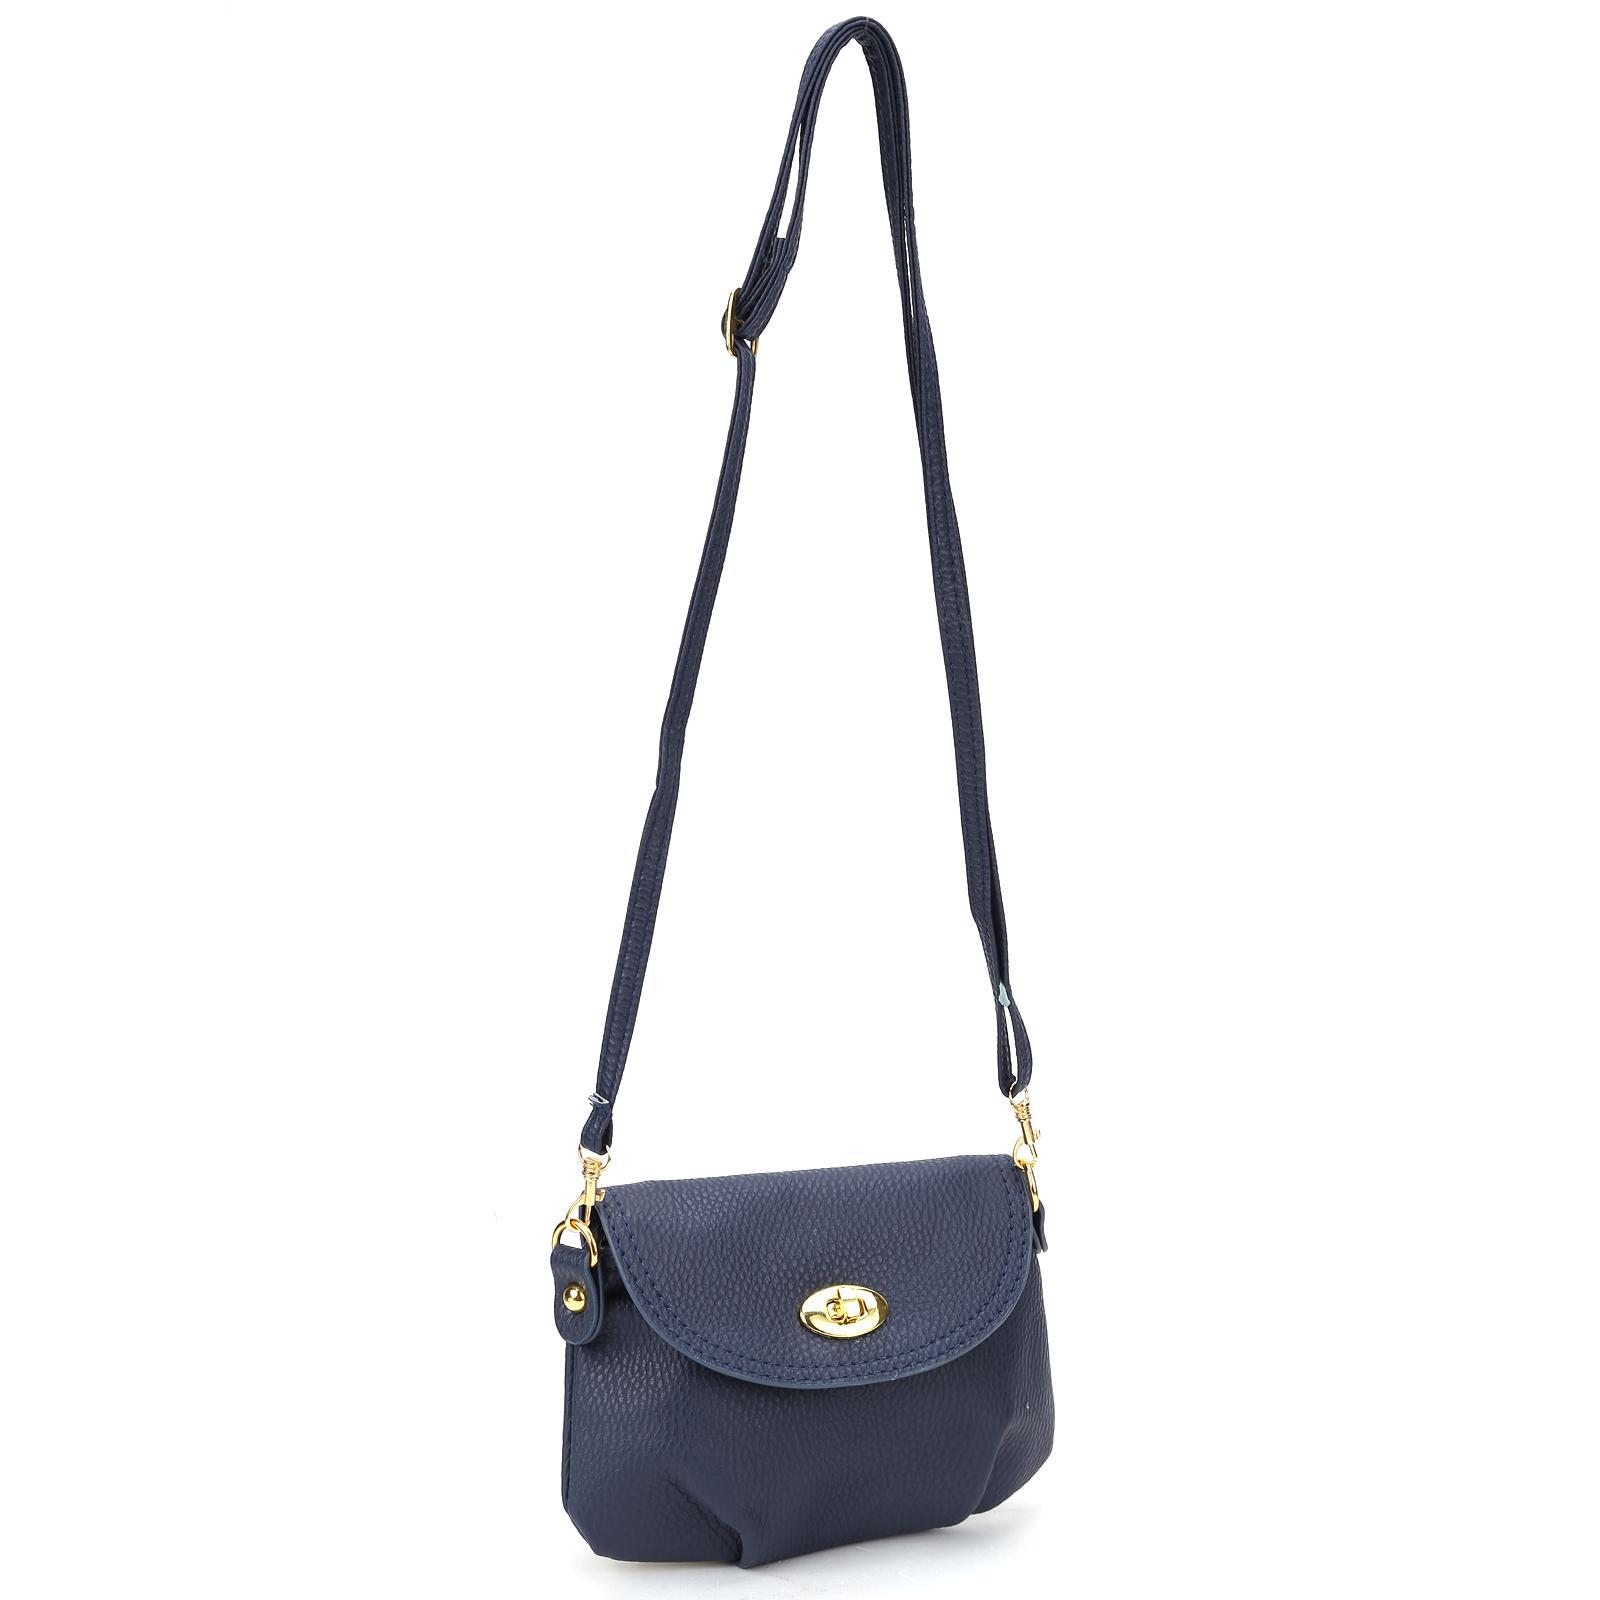 ee0fce156263 Ladies Small Satchel Leather Handbag Crossbody Shoulder Messenger Totes Bags